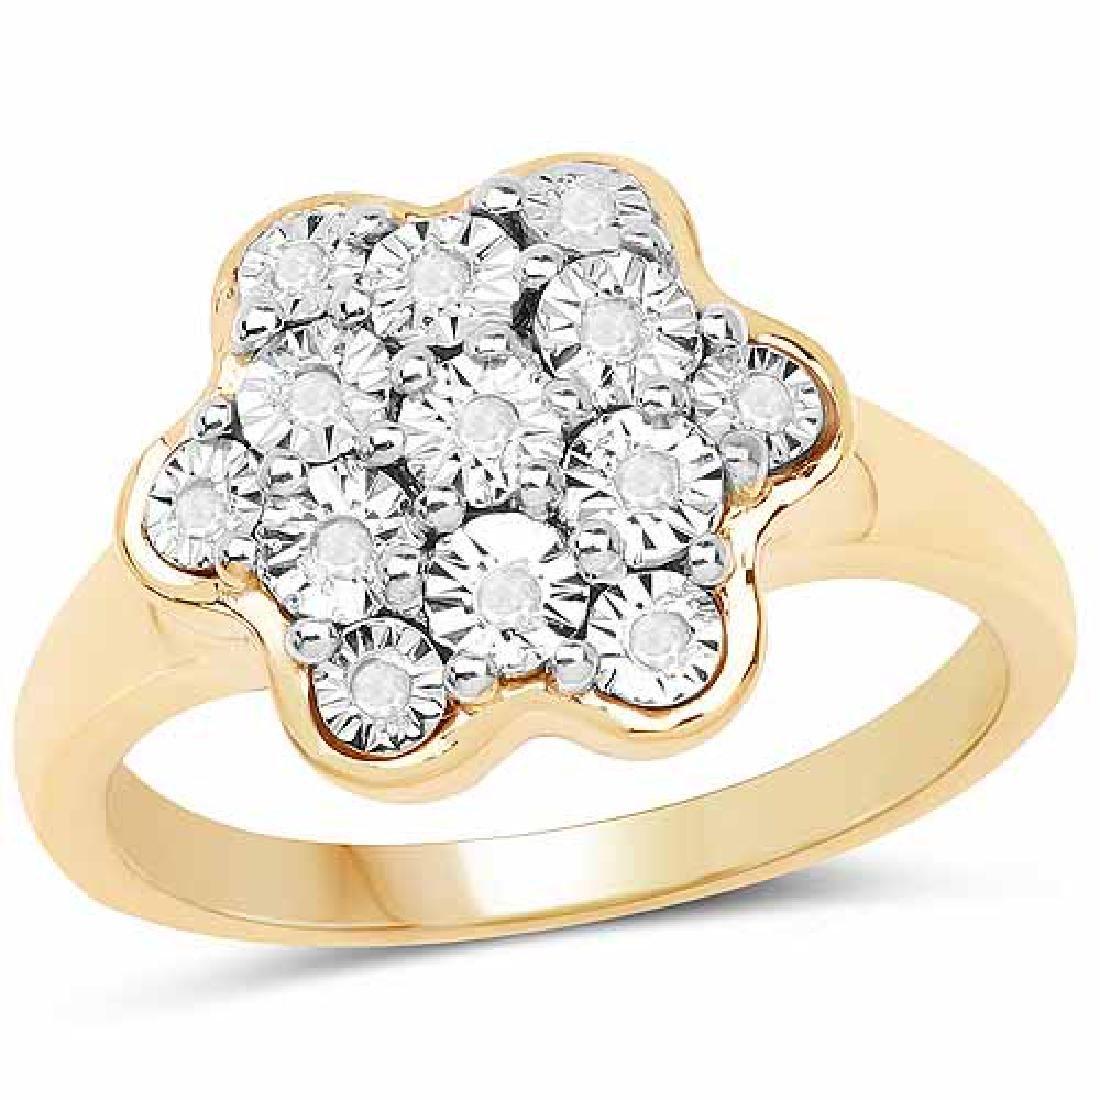 14K Yellow Gold Plated 0.07 Carat Genuine White Diamond